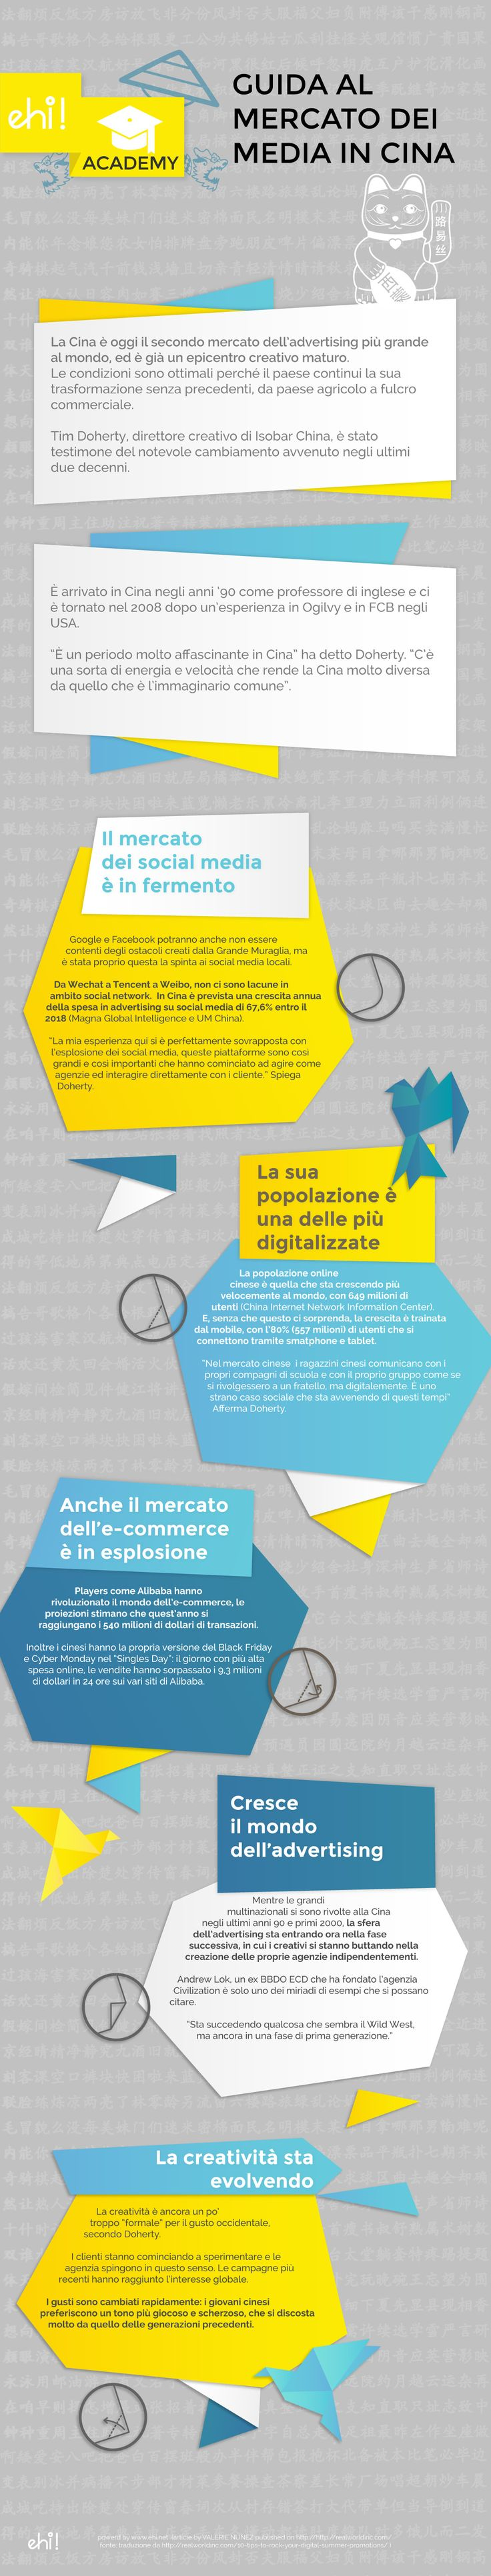 guida al mercato dei media in cina #infografica #infographic #infographicoftheday